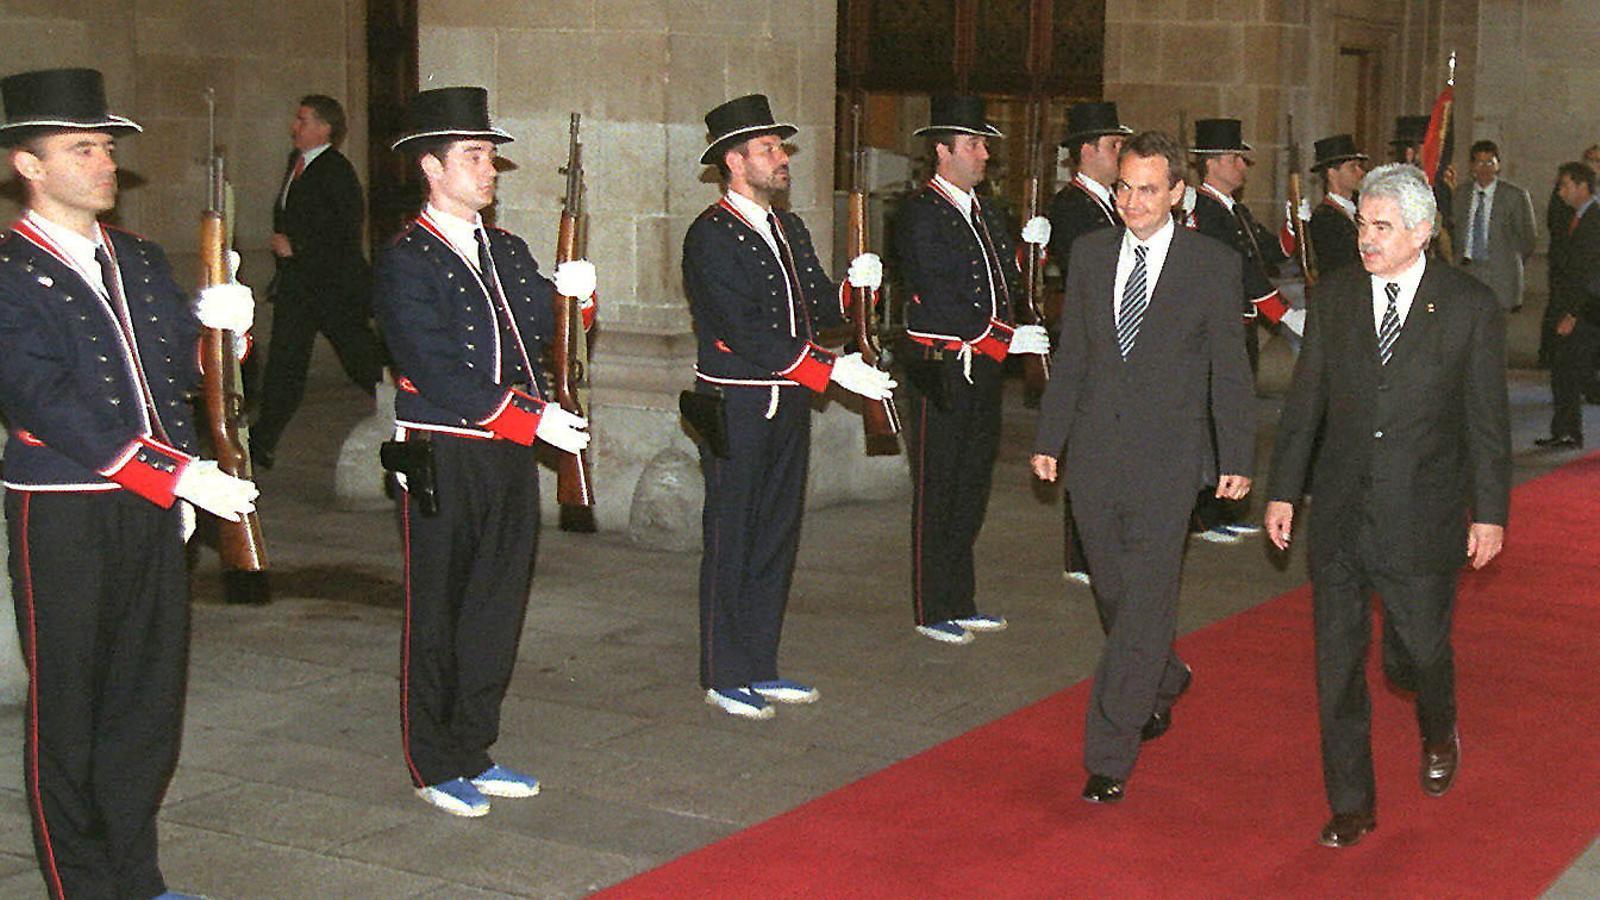 Josep Tarradellas va rebre les credencials de president de mans d'Adolfo Suárez.  Felipe González donant el condol a la viuda de Josep Tarradellas a la Plaça de la Catedral.  Pasqual Maragall i José Luis Rodríguez Zapatero junts al Palau de la Generalitat.